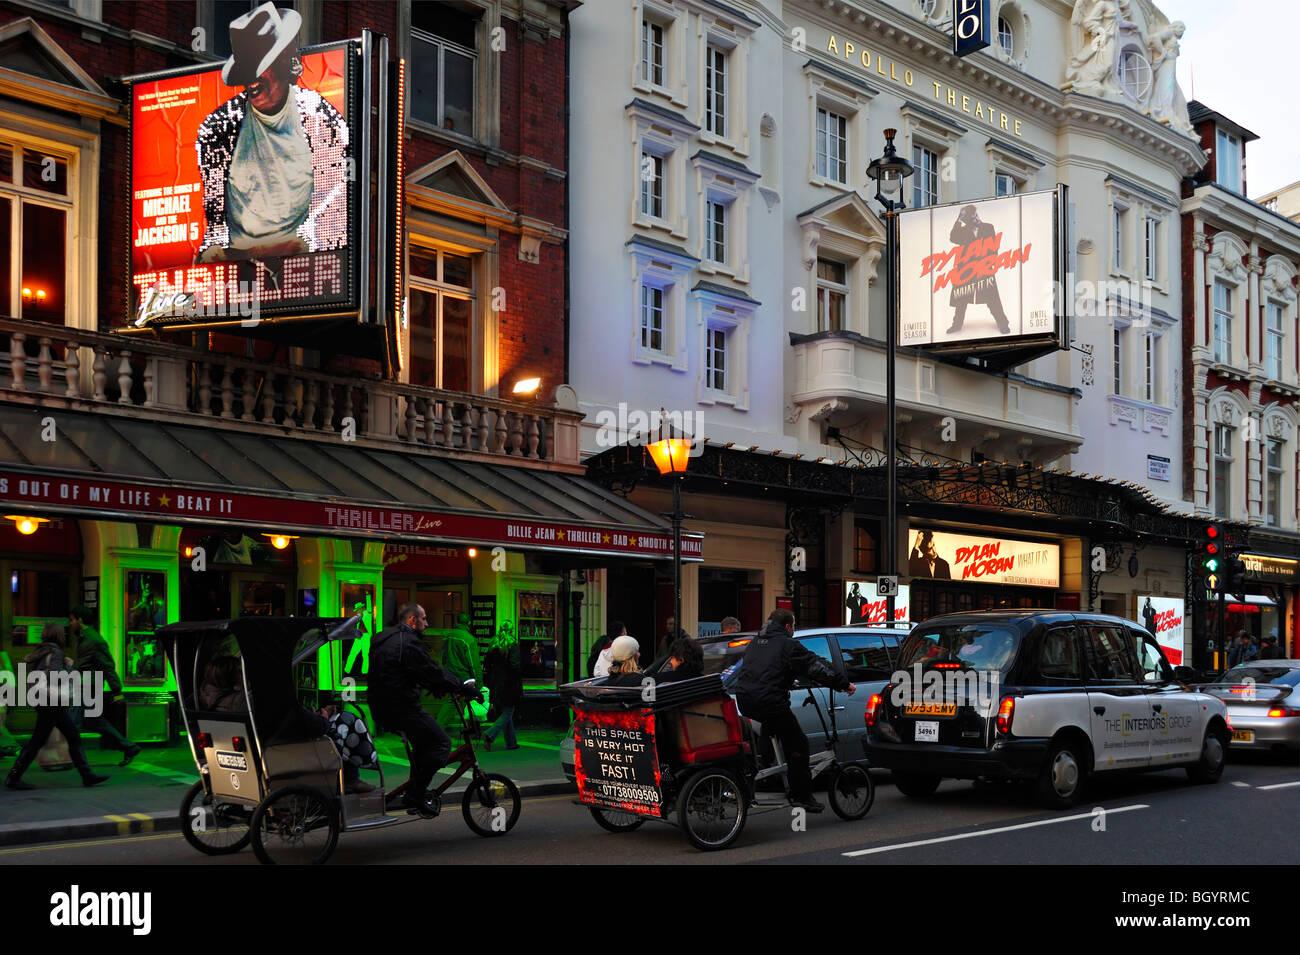 Apollo Theatre Shaftesbury Avenue London - Stock Image